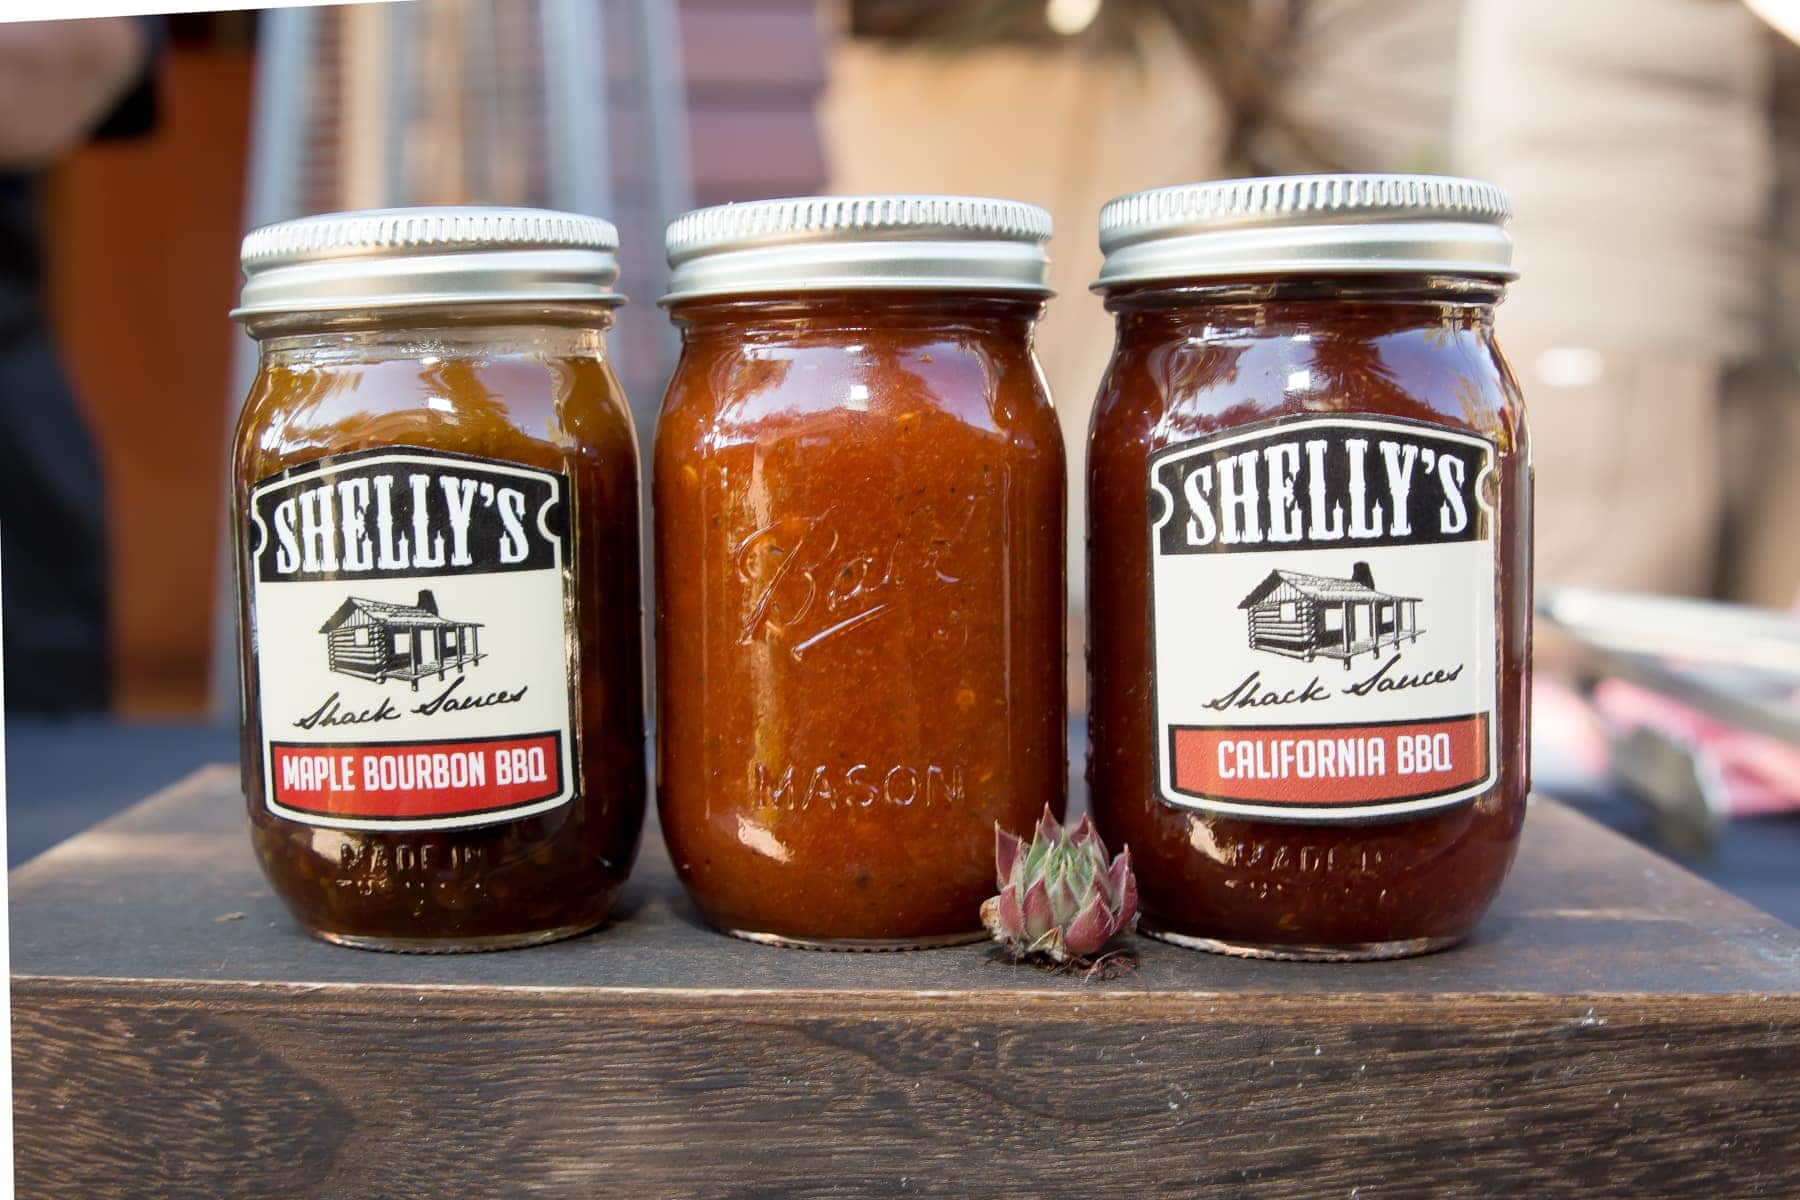 sauce in jars